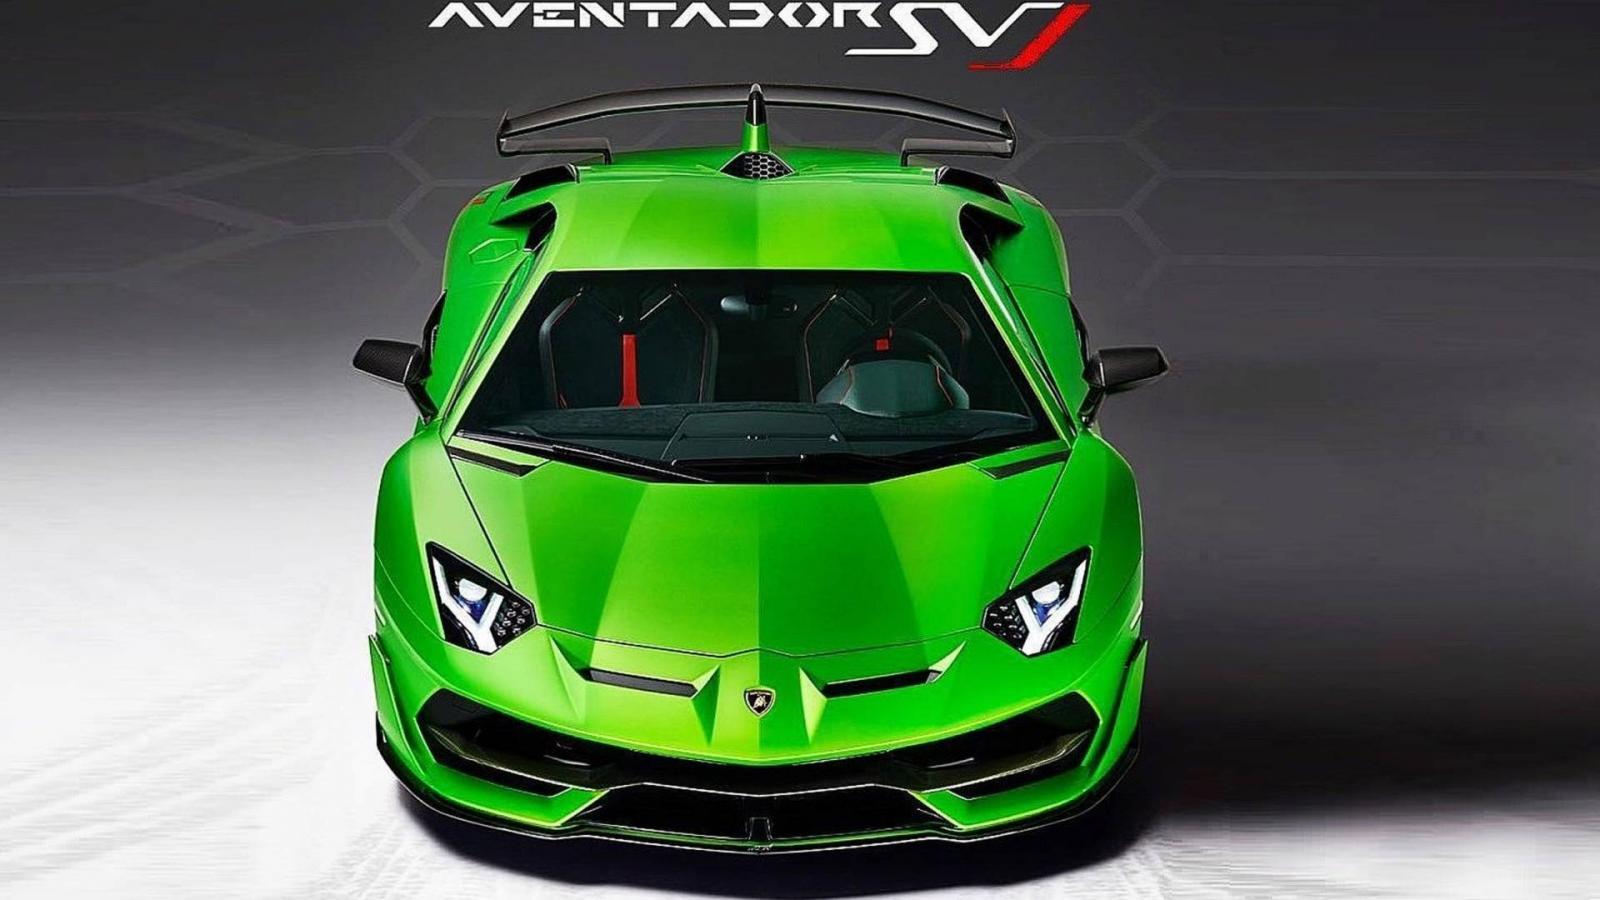 Lamborghini Aventador SVJ частично рассекретили